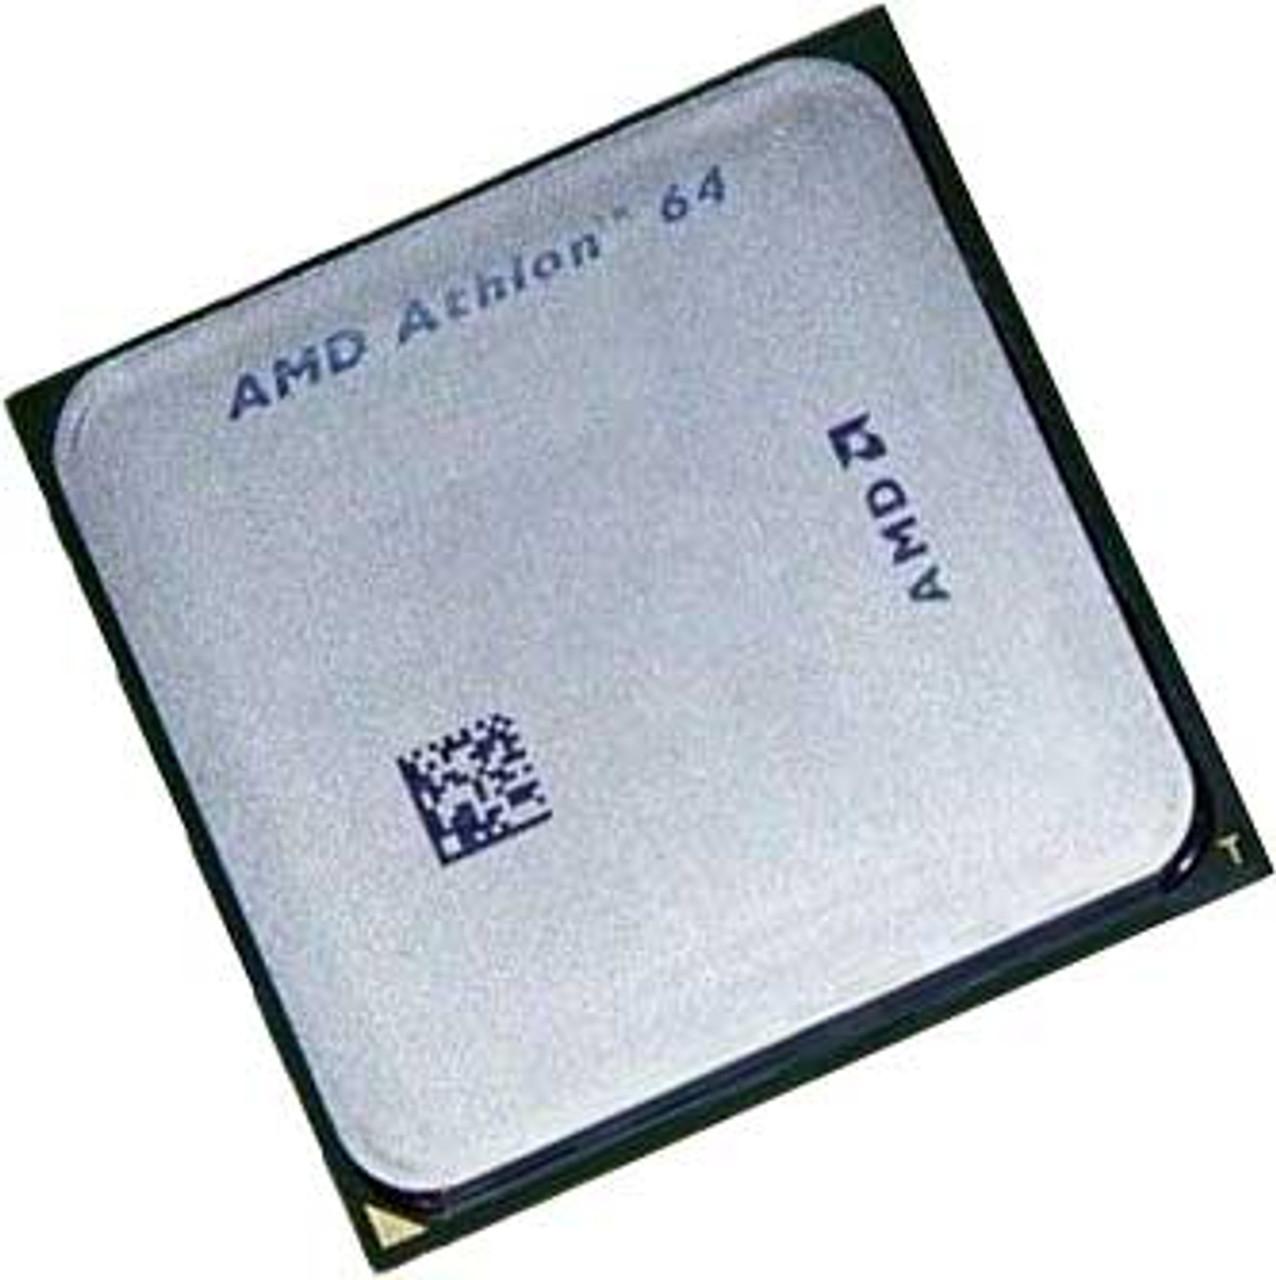 Amd Adx635wfk42gi 2 9 Ghz 4x 512 Kb Am3 Athlon Ii X4 635 Cpu Processor Cpu Medics